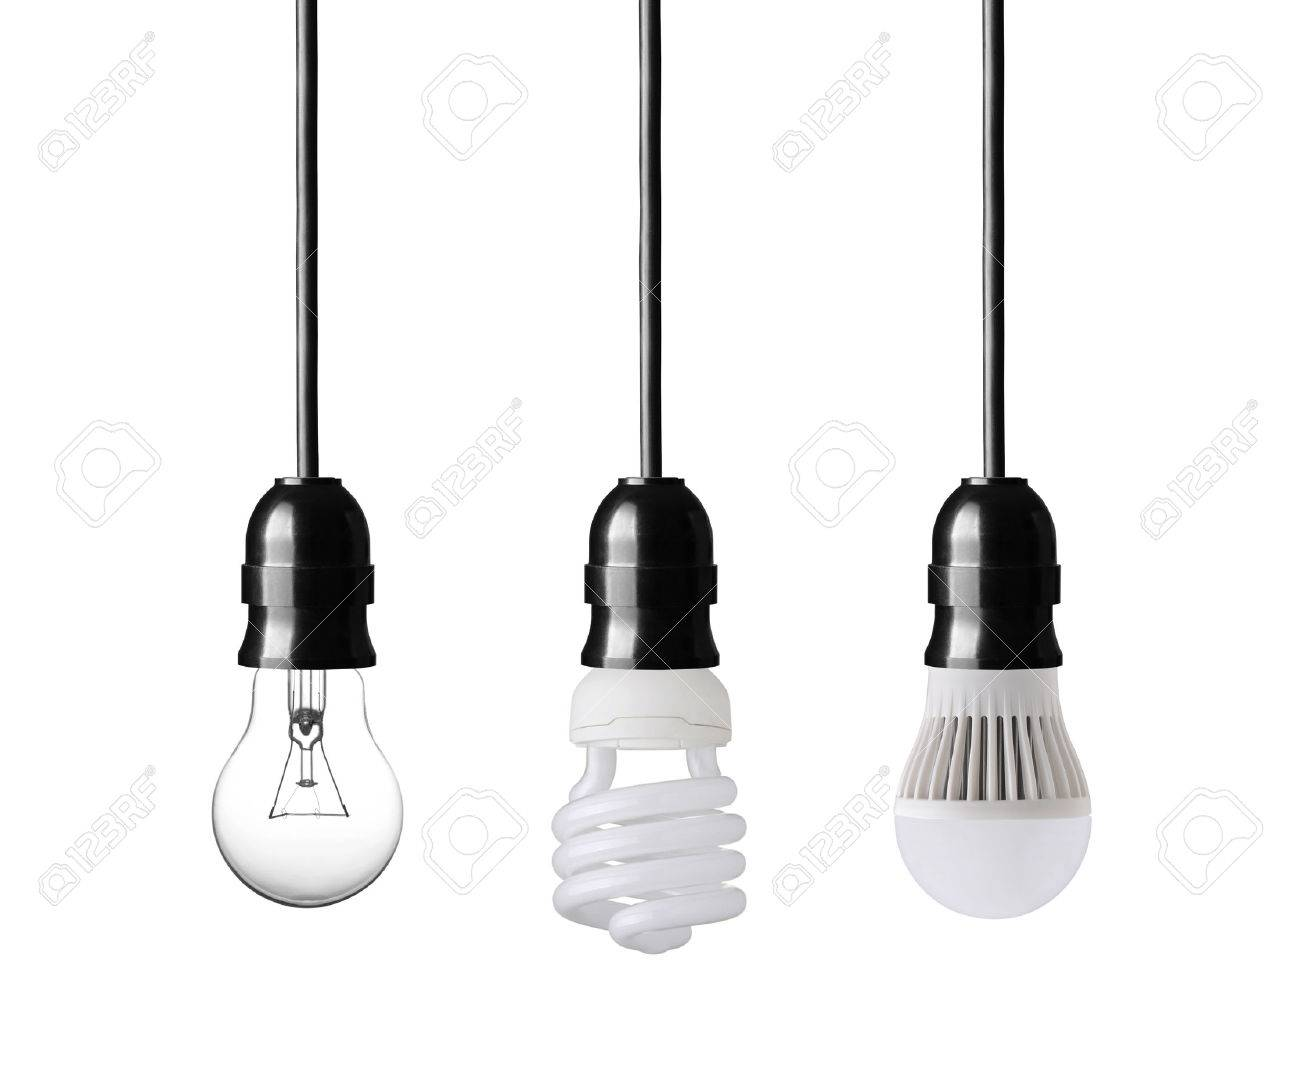 Led lampen oder energiesparlampen gallery mbel furniture ideen glhbirne energiesparlampe und led lampe auf wei lizenzfreie glhbirne energiesparlampe und led lampe auf wei lizenzfreie parisarafo Gallery